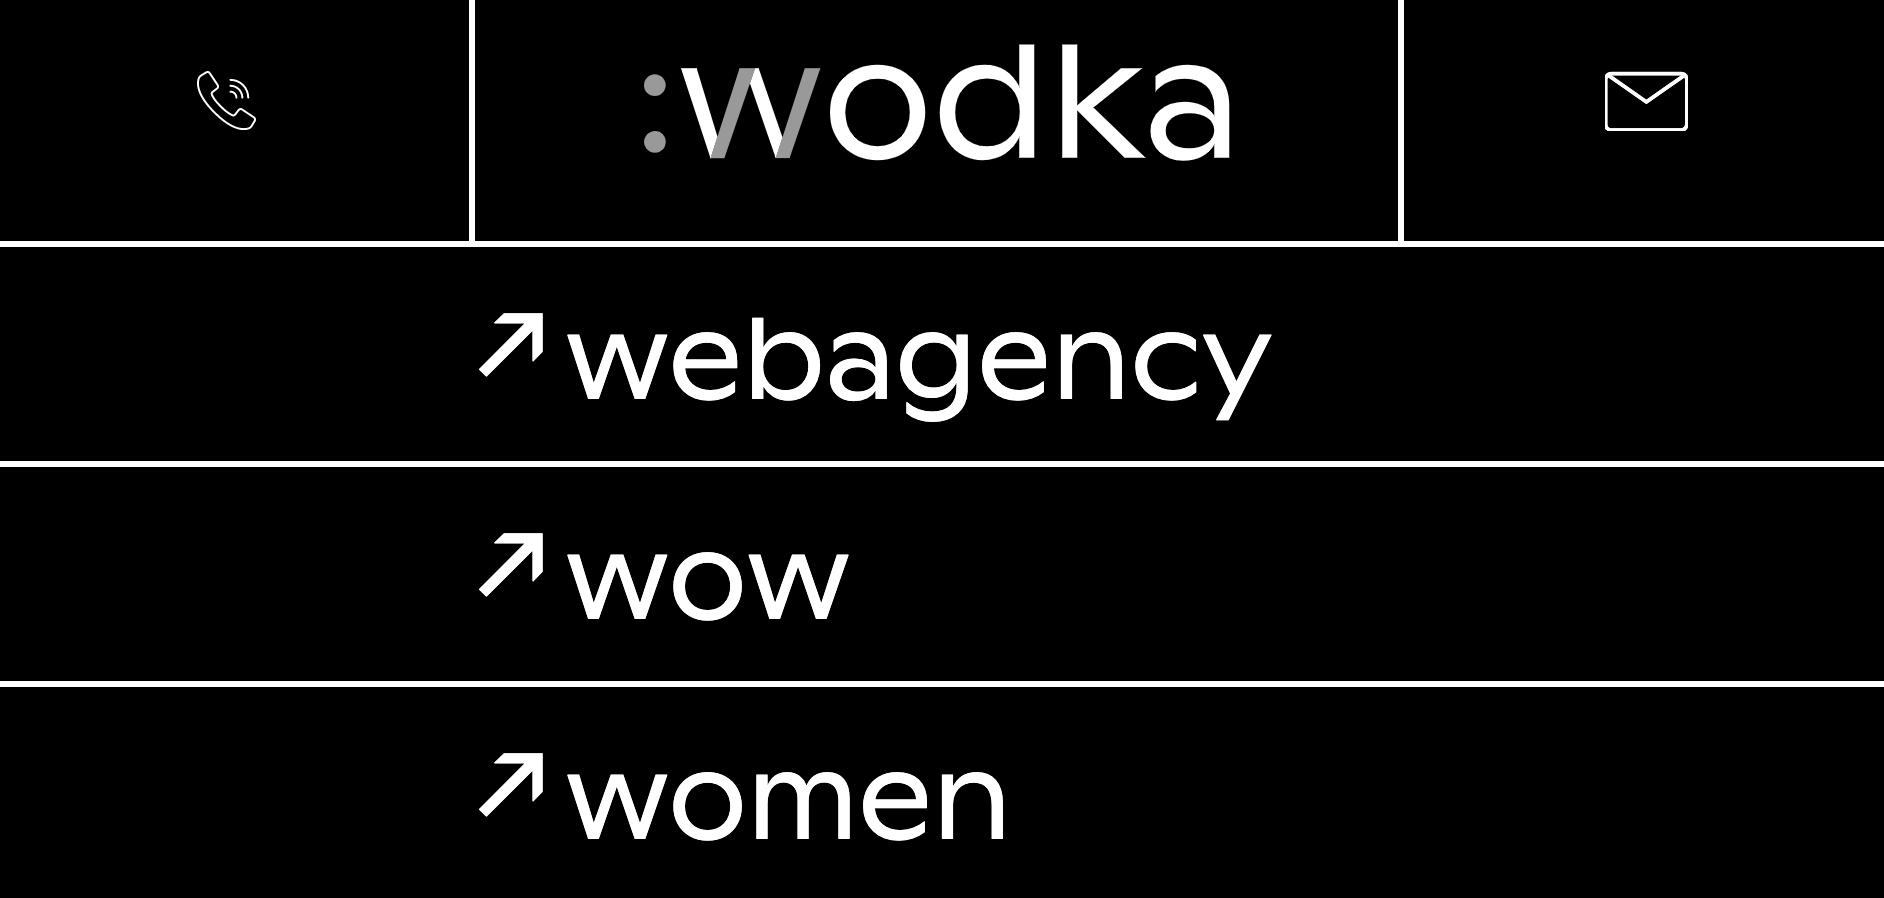 Wodka web agency ecommerce